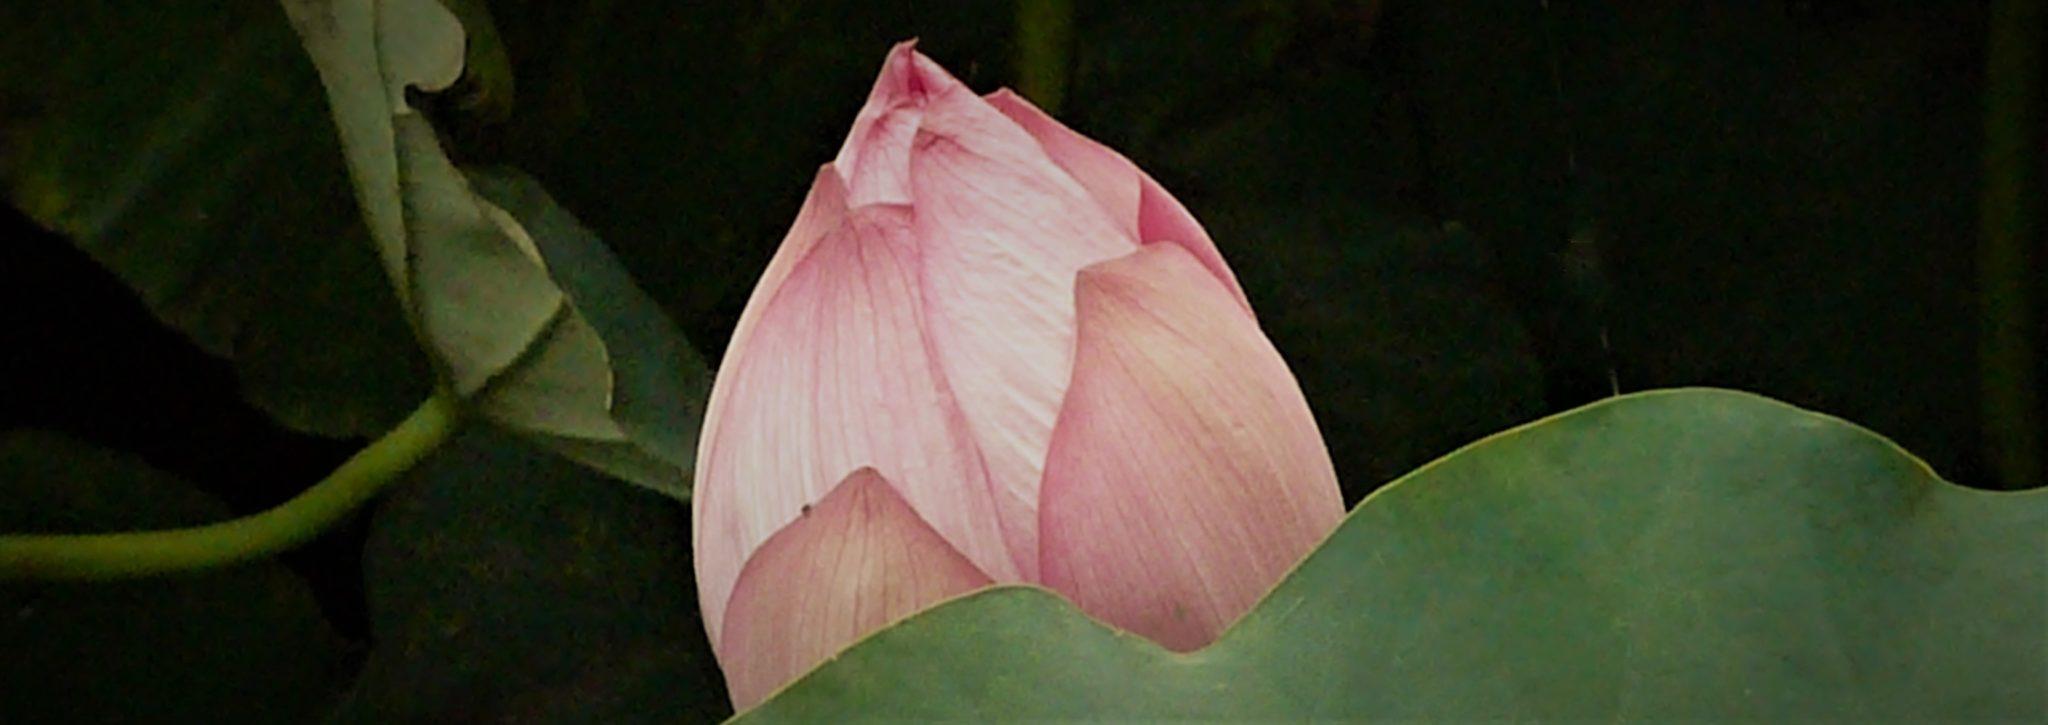 Lotus Utpala Ashtamangala Vajrayana